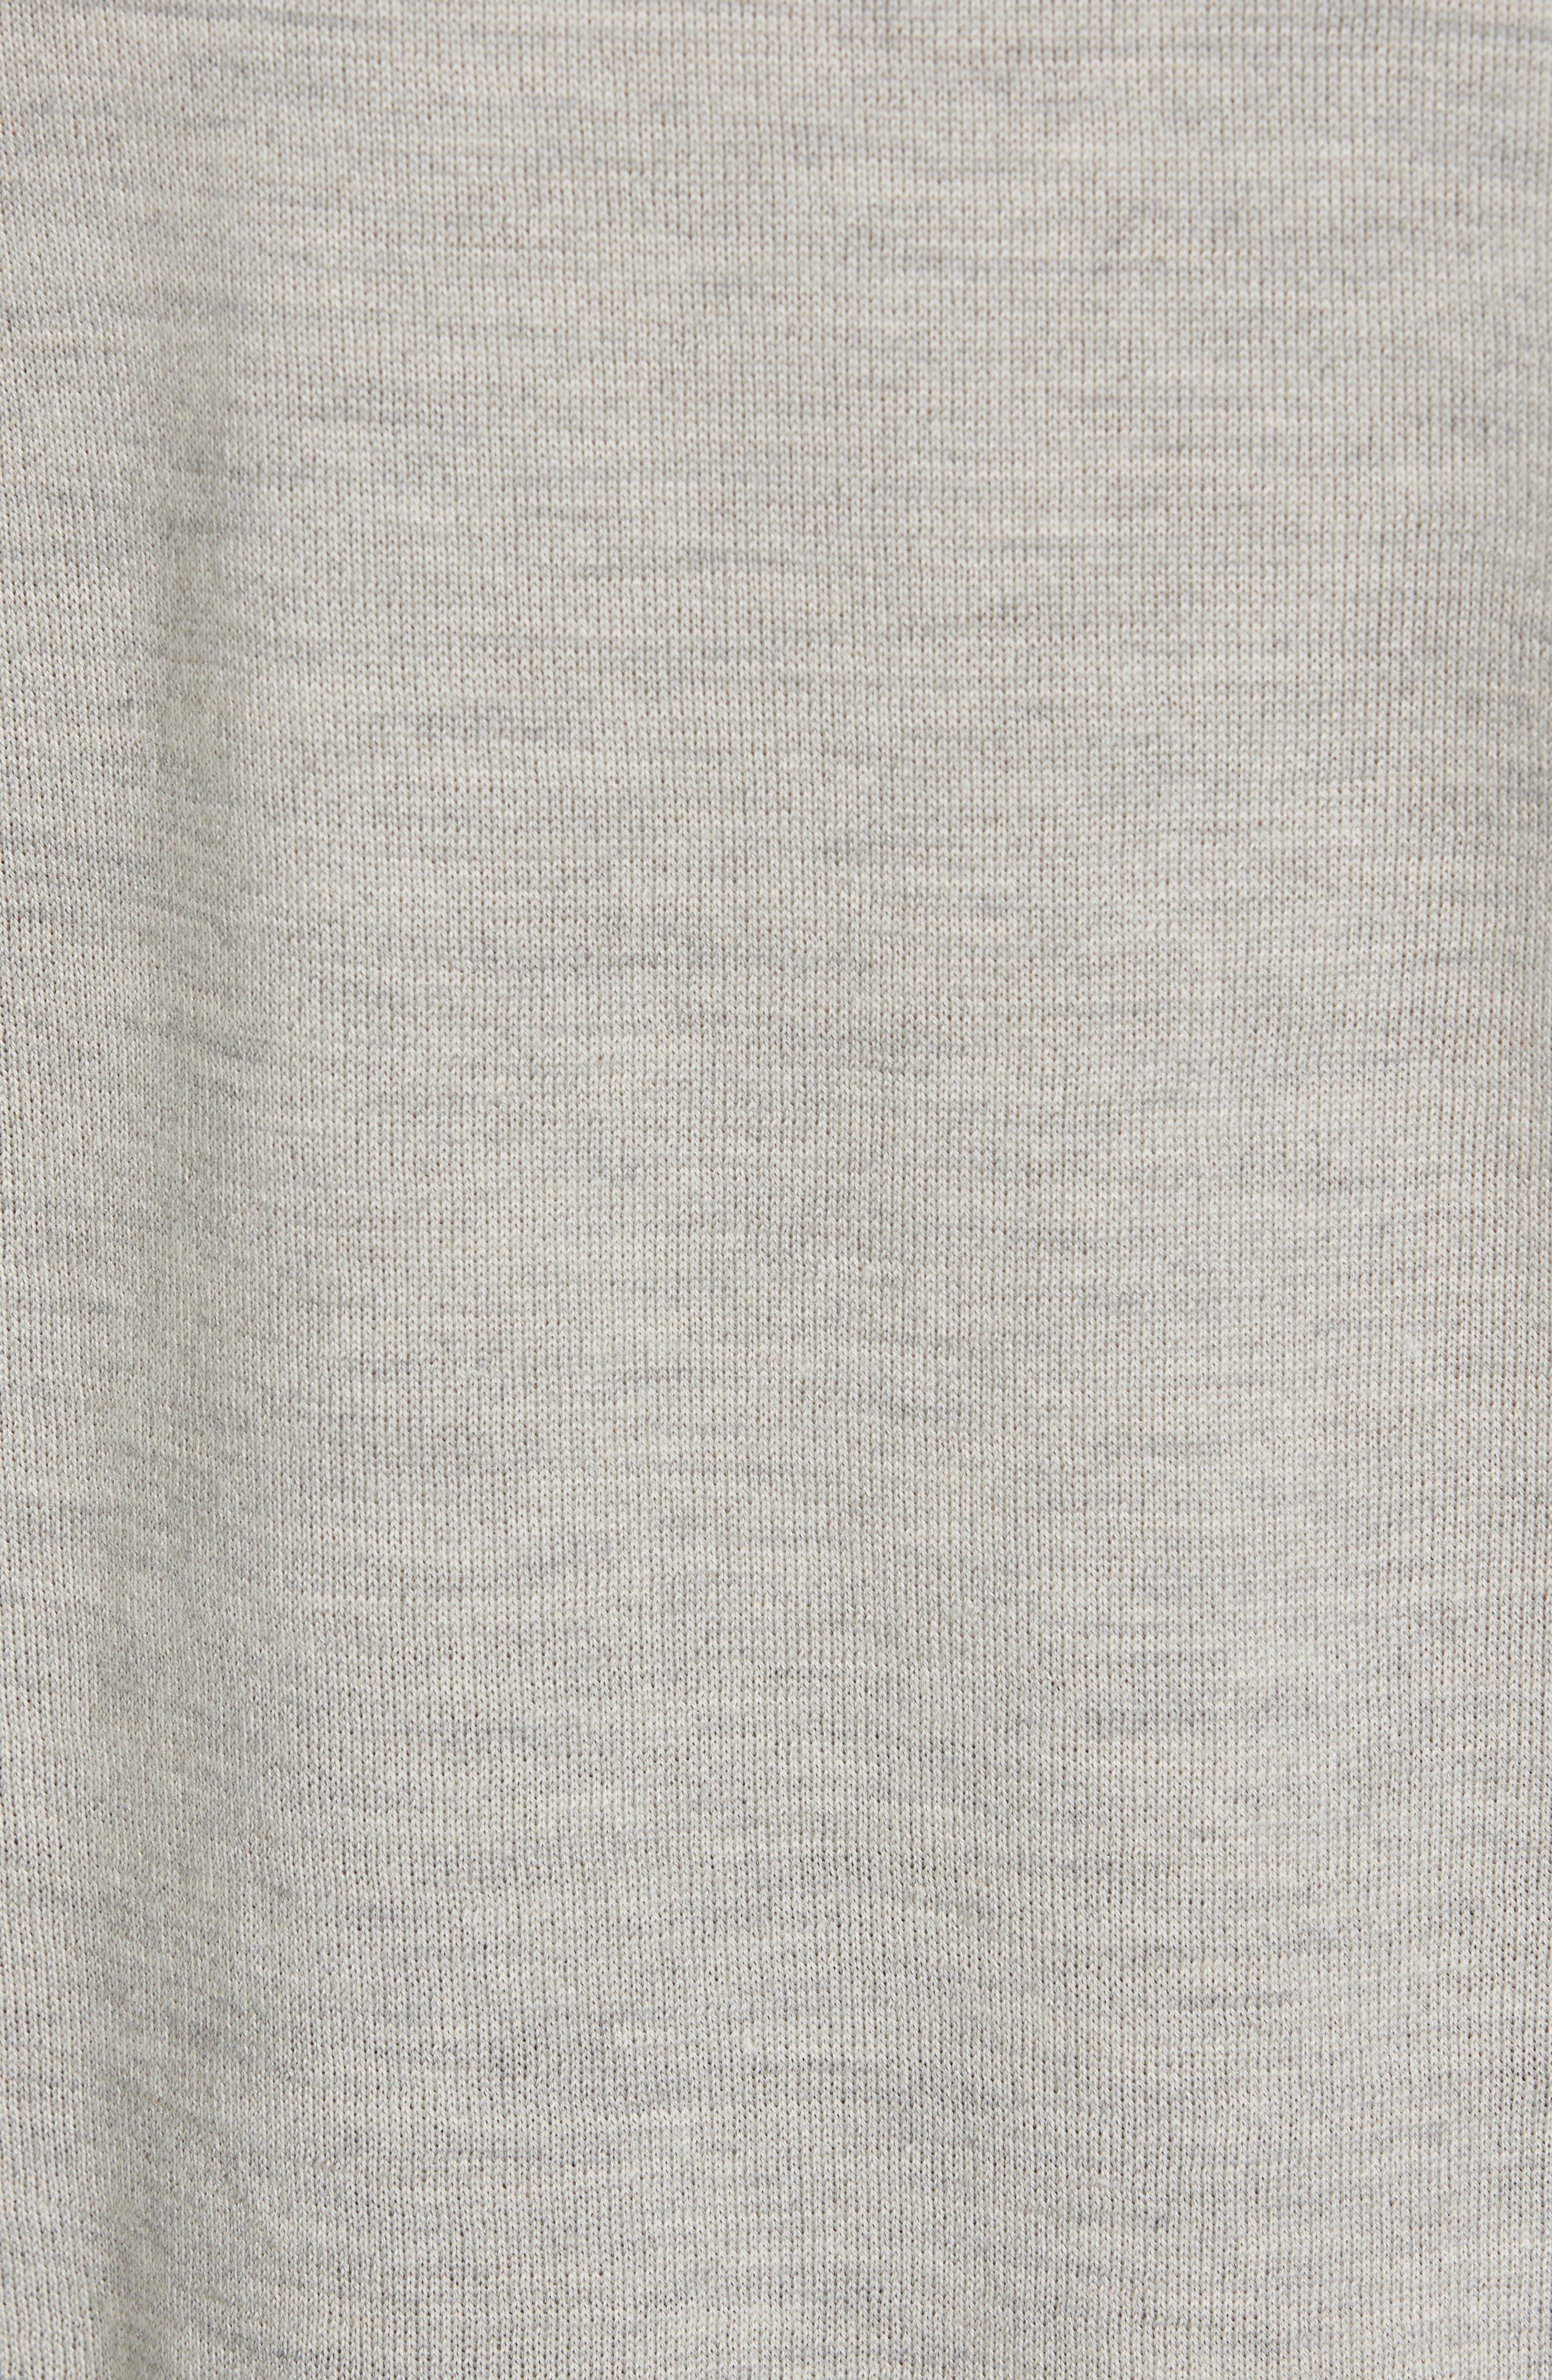 POLO RALPH LAUREN,                             V-Neck Wool, Silk & Cashmere Sweater,                             Alternate thumbnail 5, color,                             LIGHT VINTAGE HEATHER